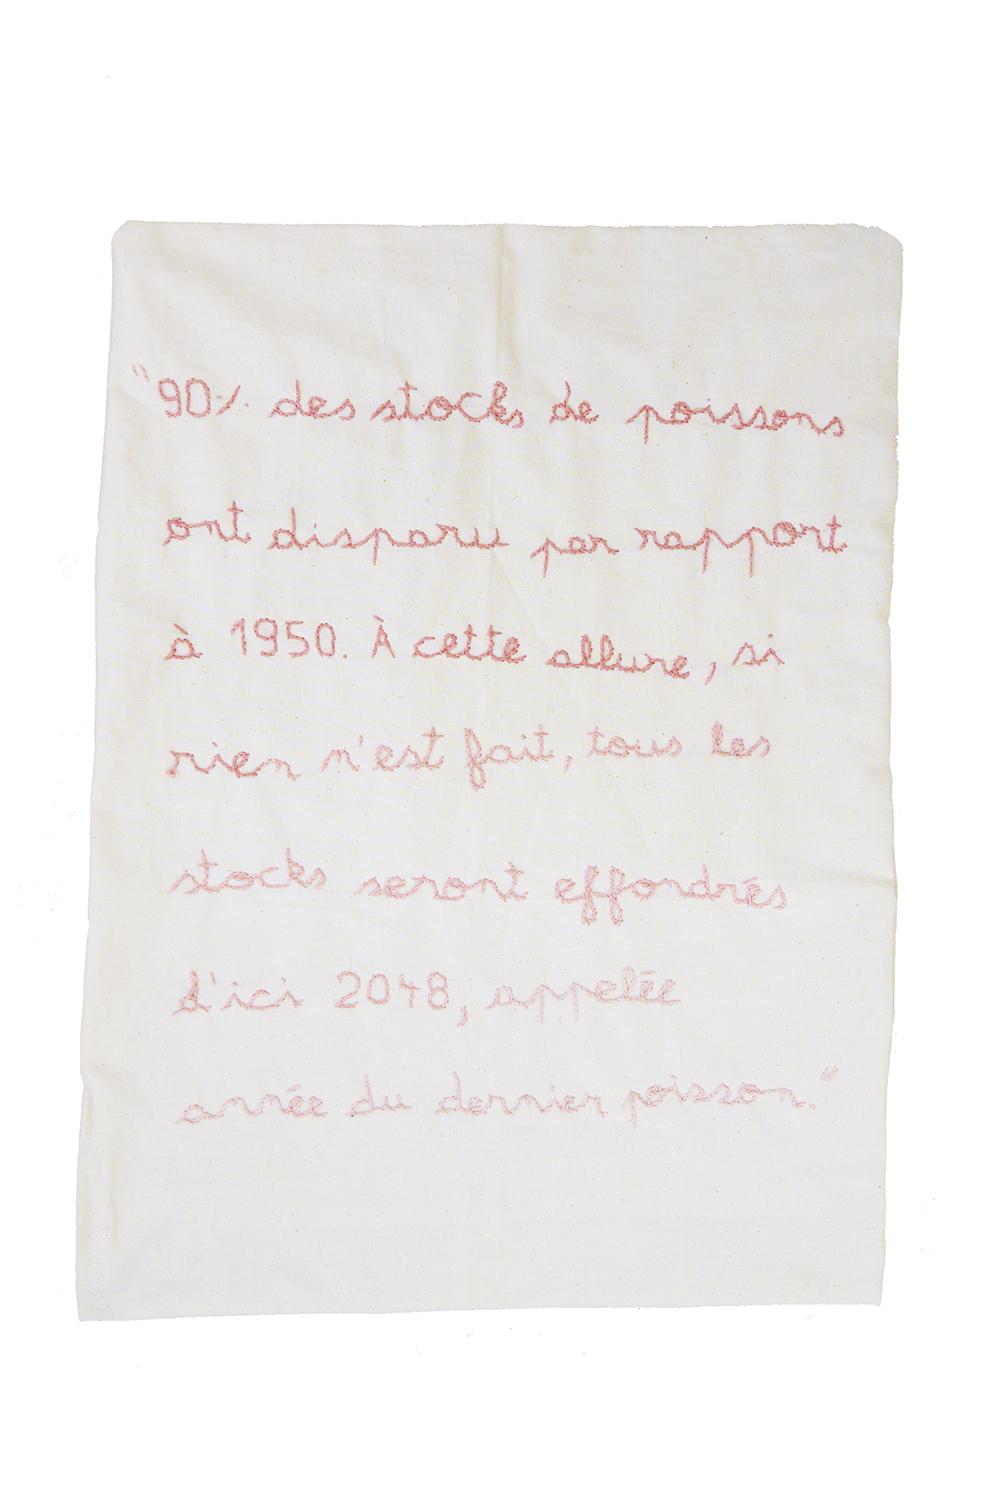 09. Broderie inside Penser, Manger, Partager Johanna Tagada.jpg